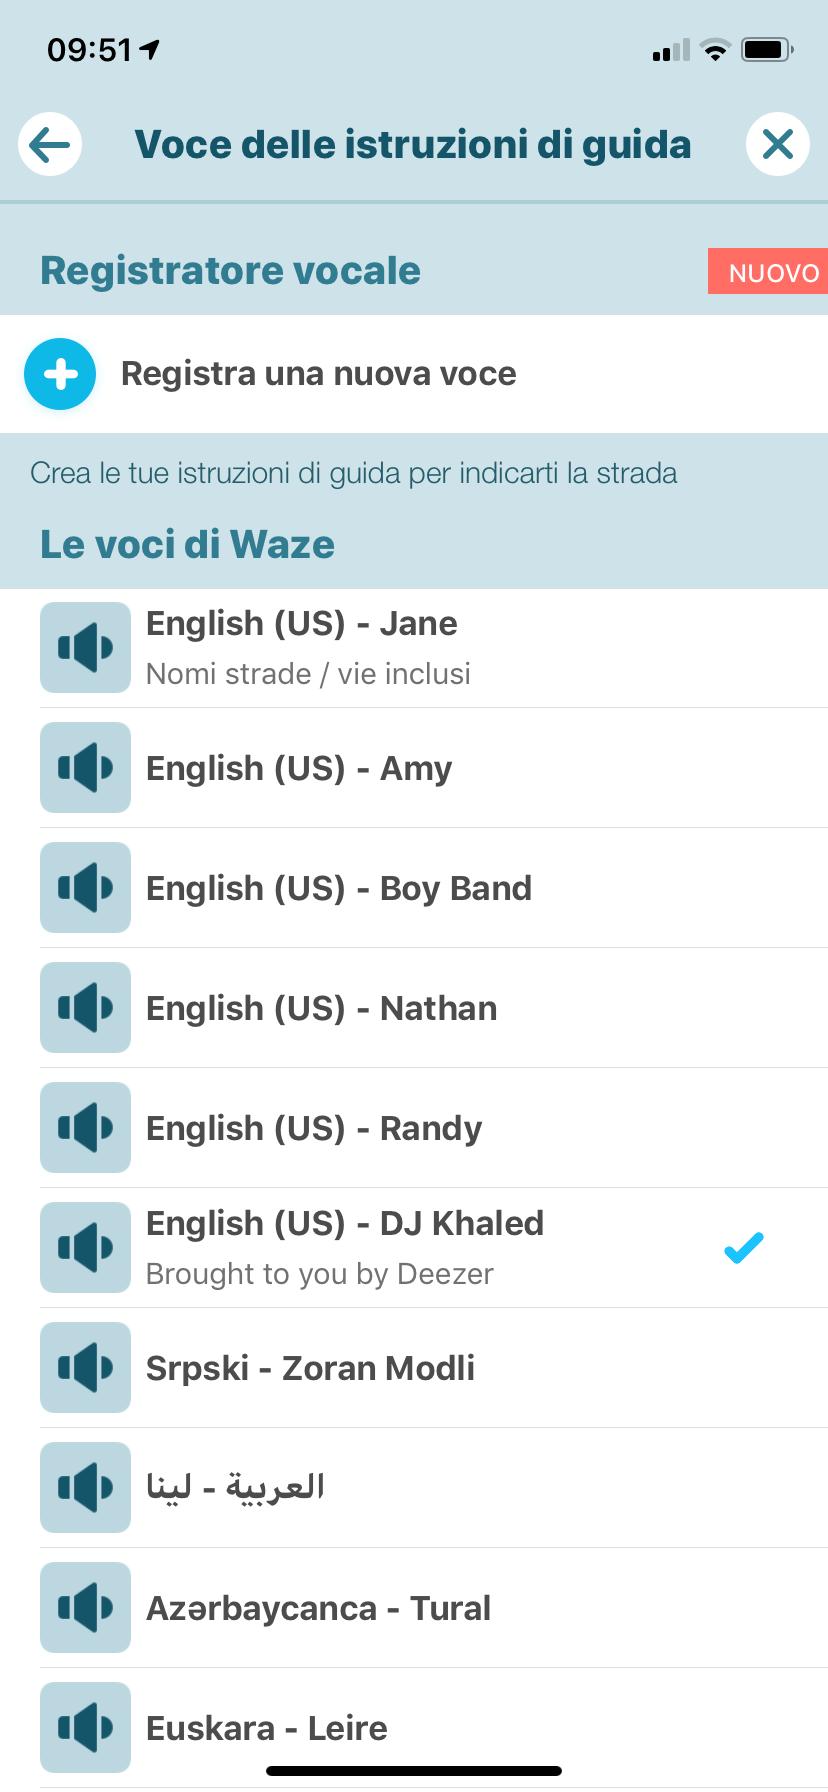 Waze e Deezer presentano la nuova voce di navigazione di DJ Khaled 2